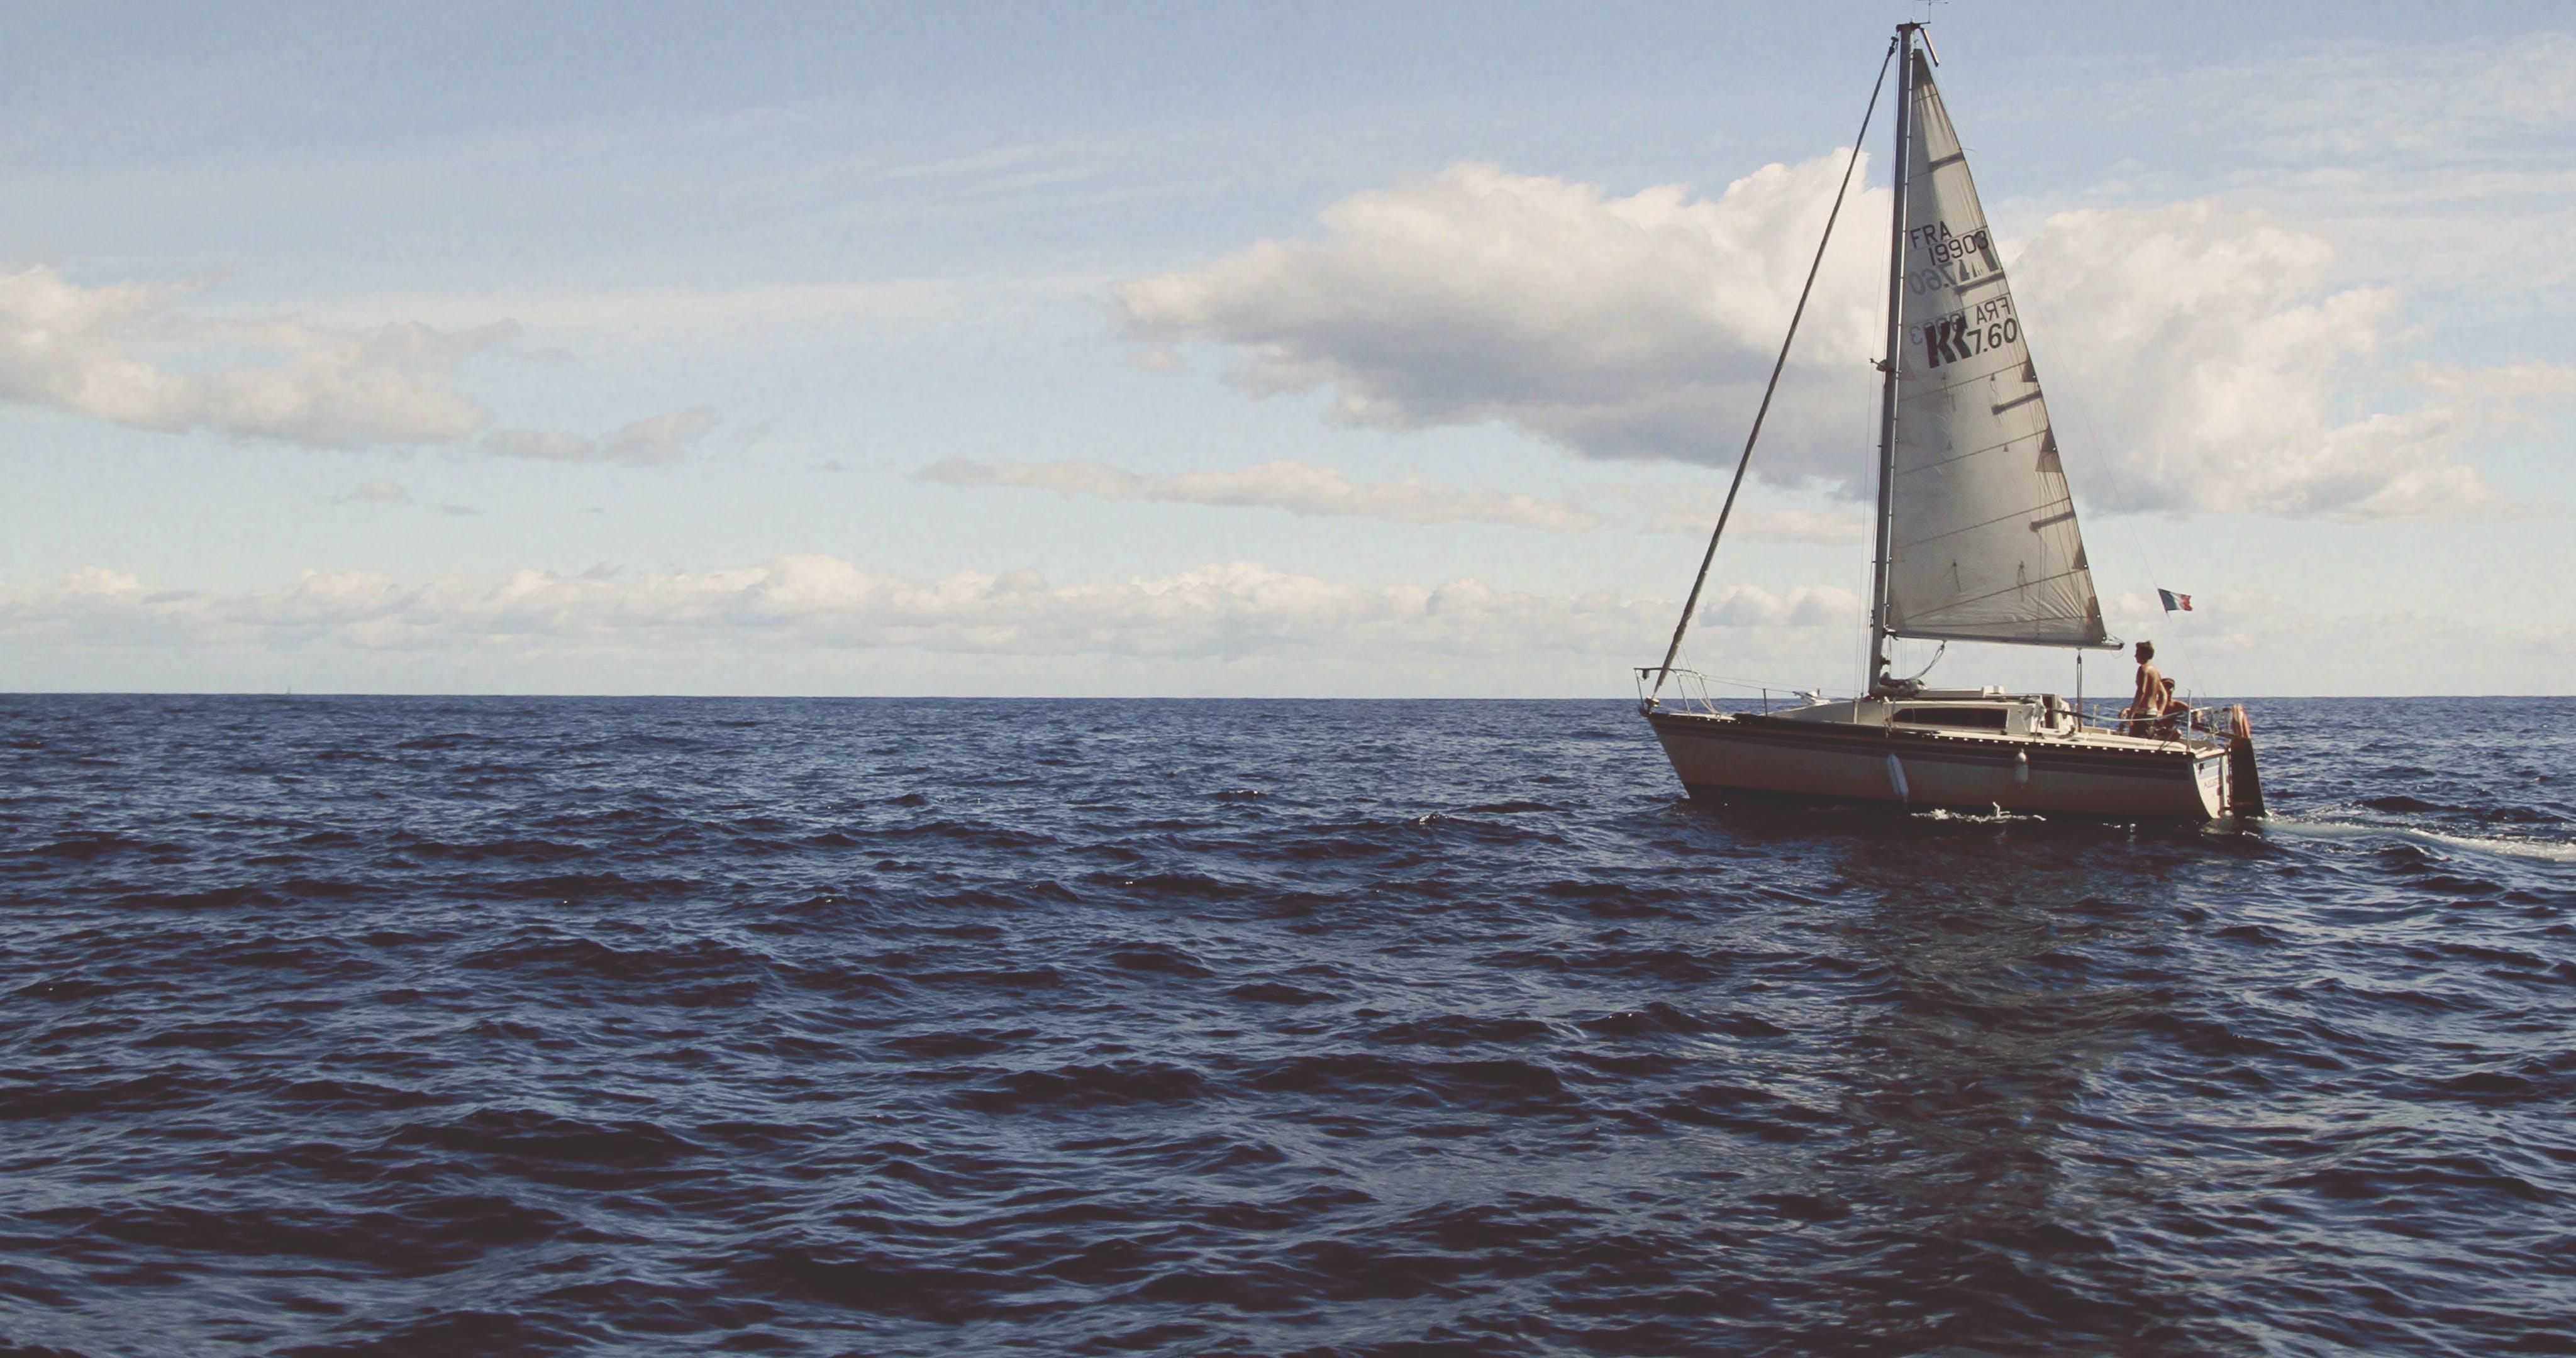 adventure, beach, boat